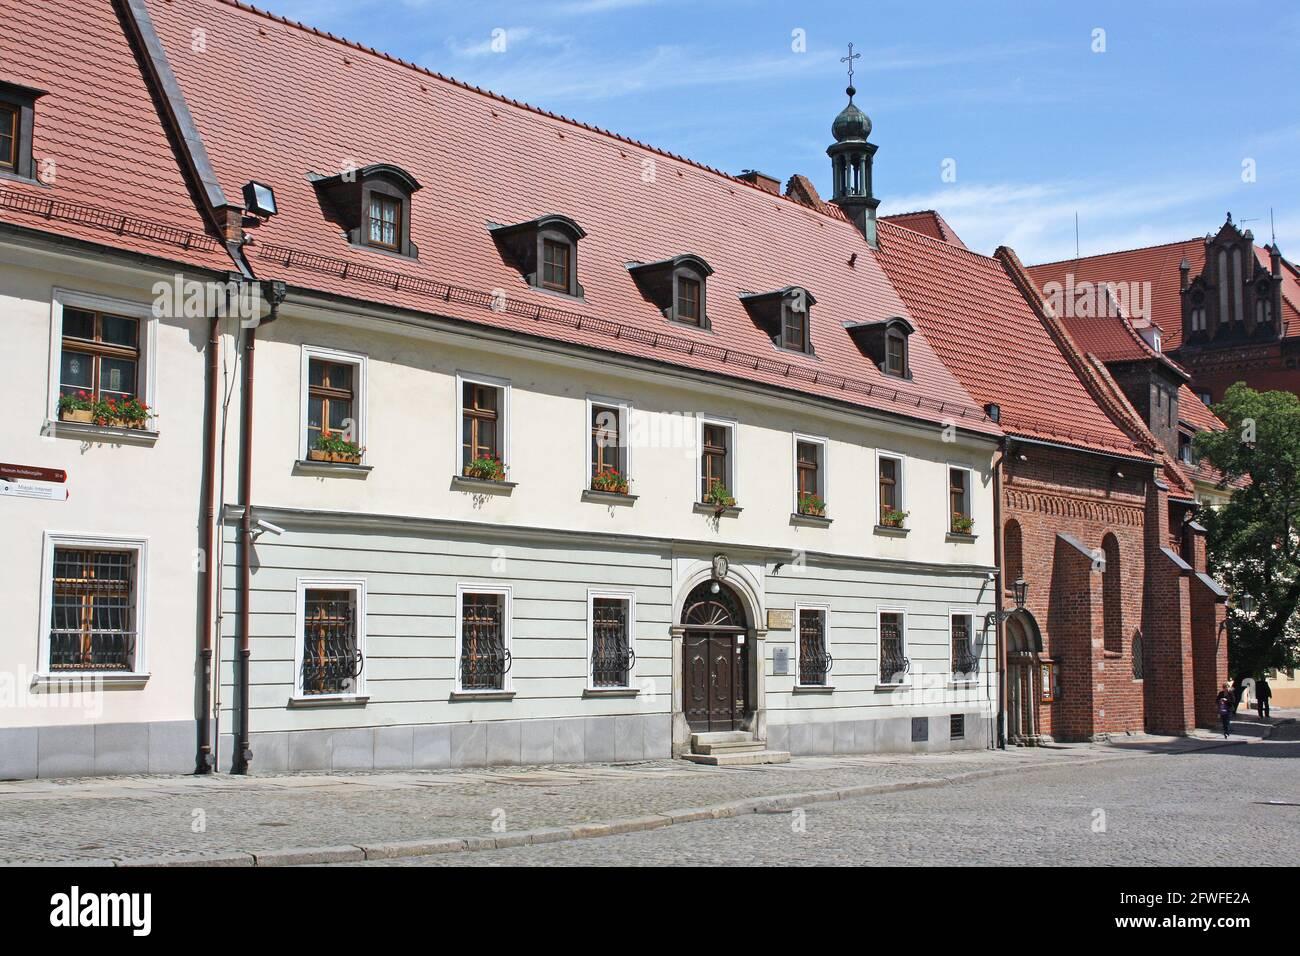 Antigua sede del Vice-Custodio de la Capilla Catedral y Guardián de Ostrów Tumski, Isla Catedral, Wroclaw, Polonia Foto de stock